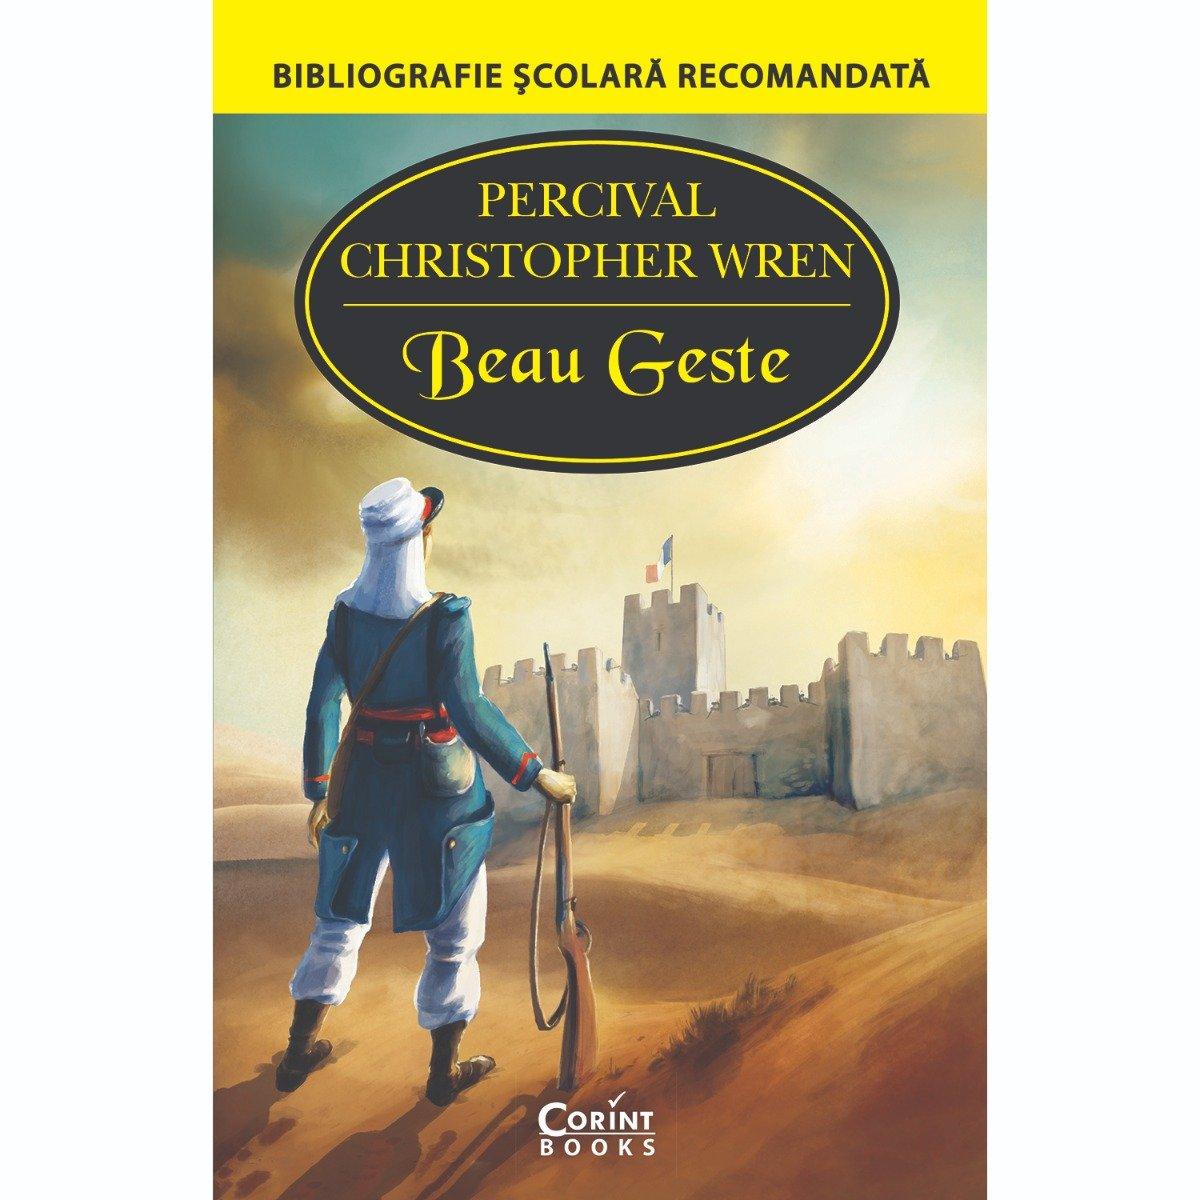 Carte Editura Corint, Beau Geste, Percival Christopher Wren